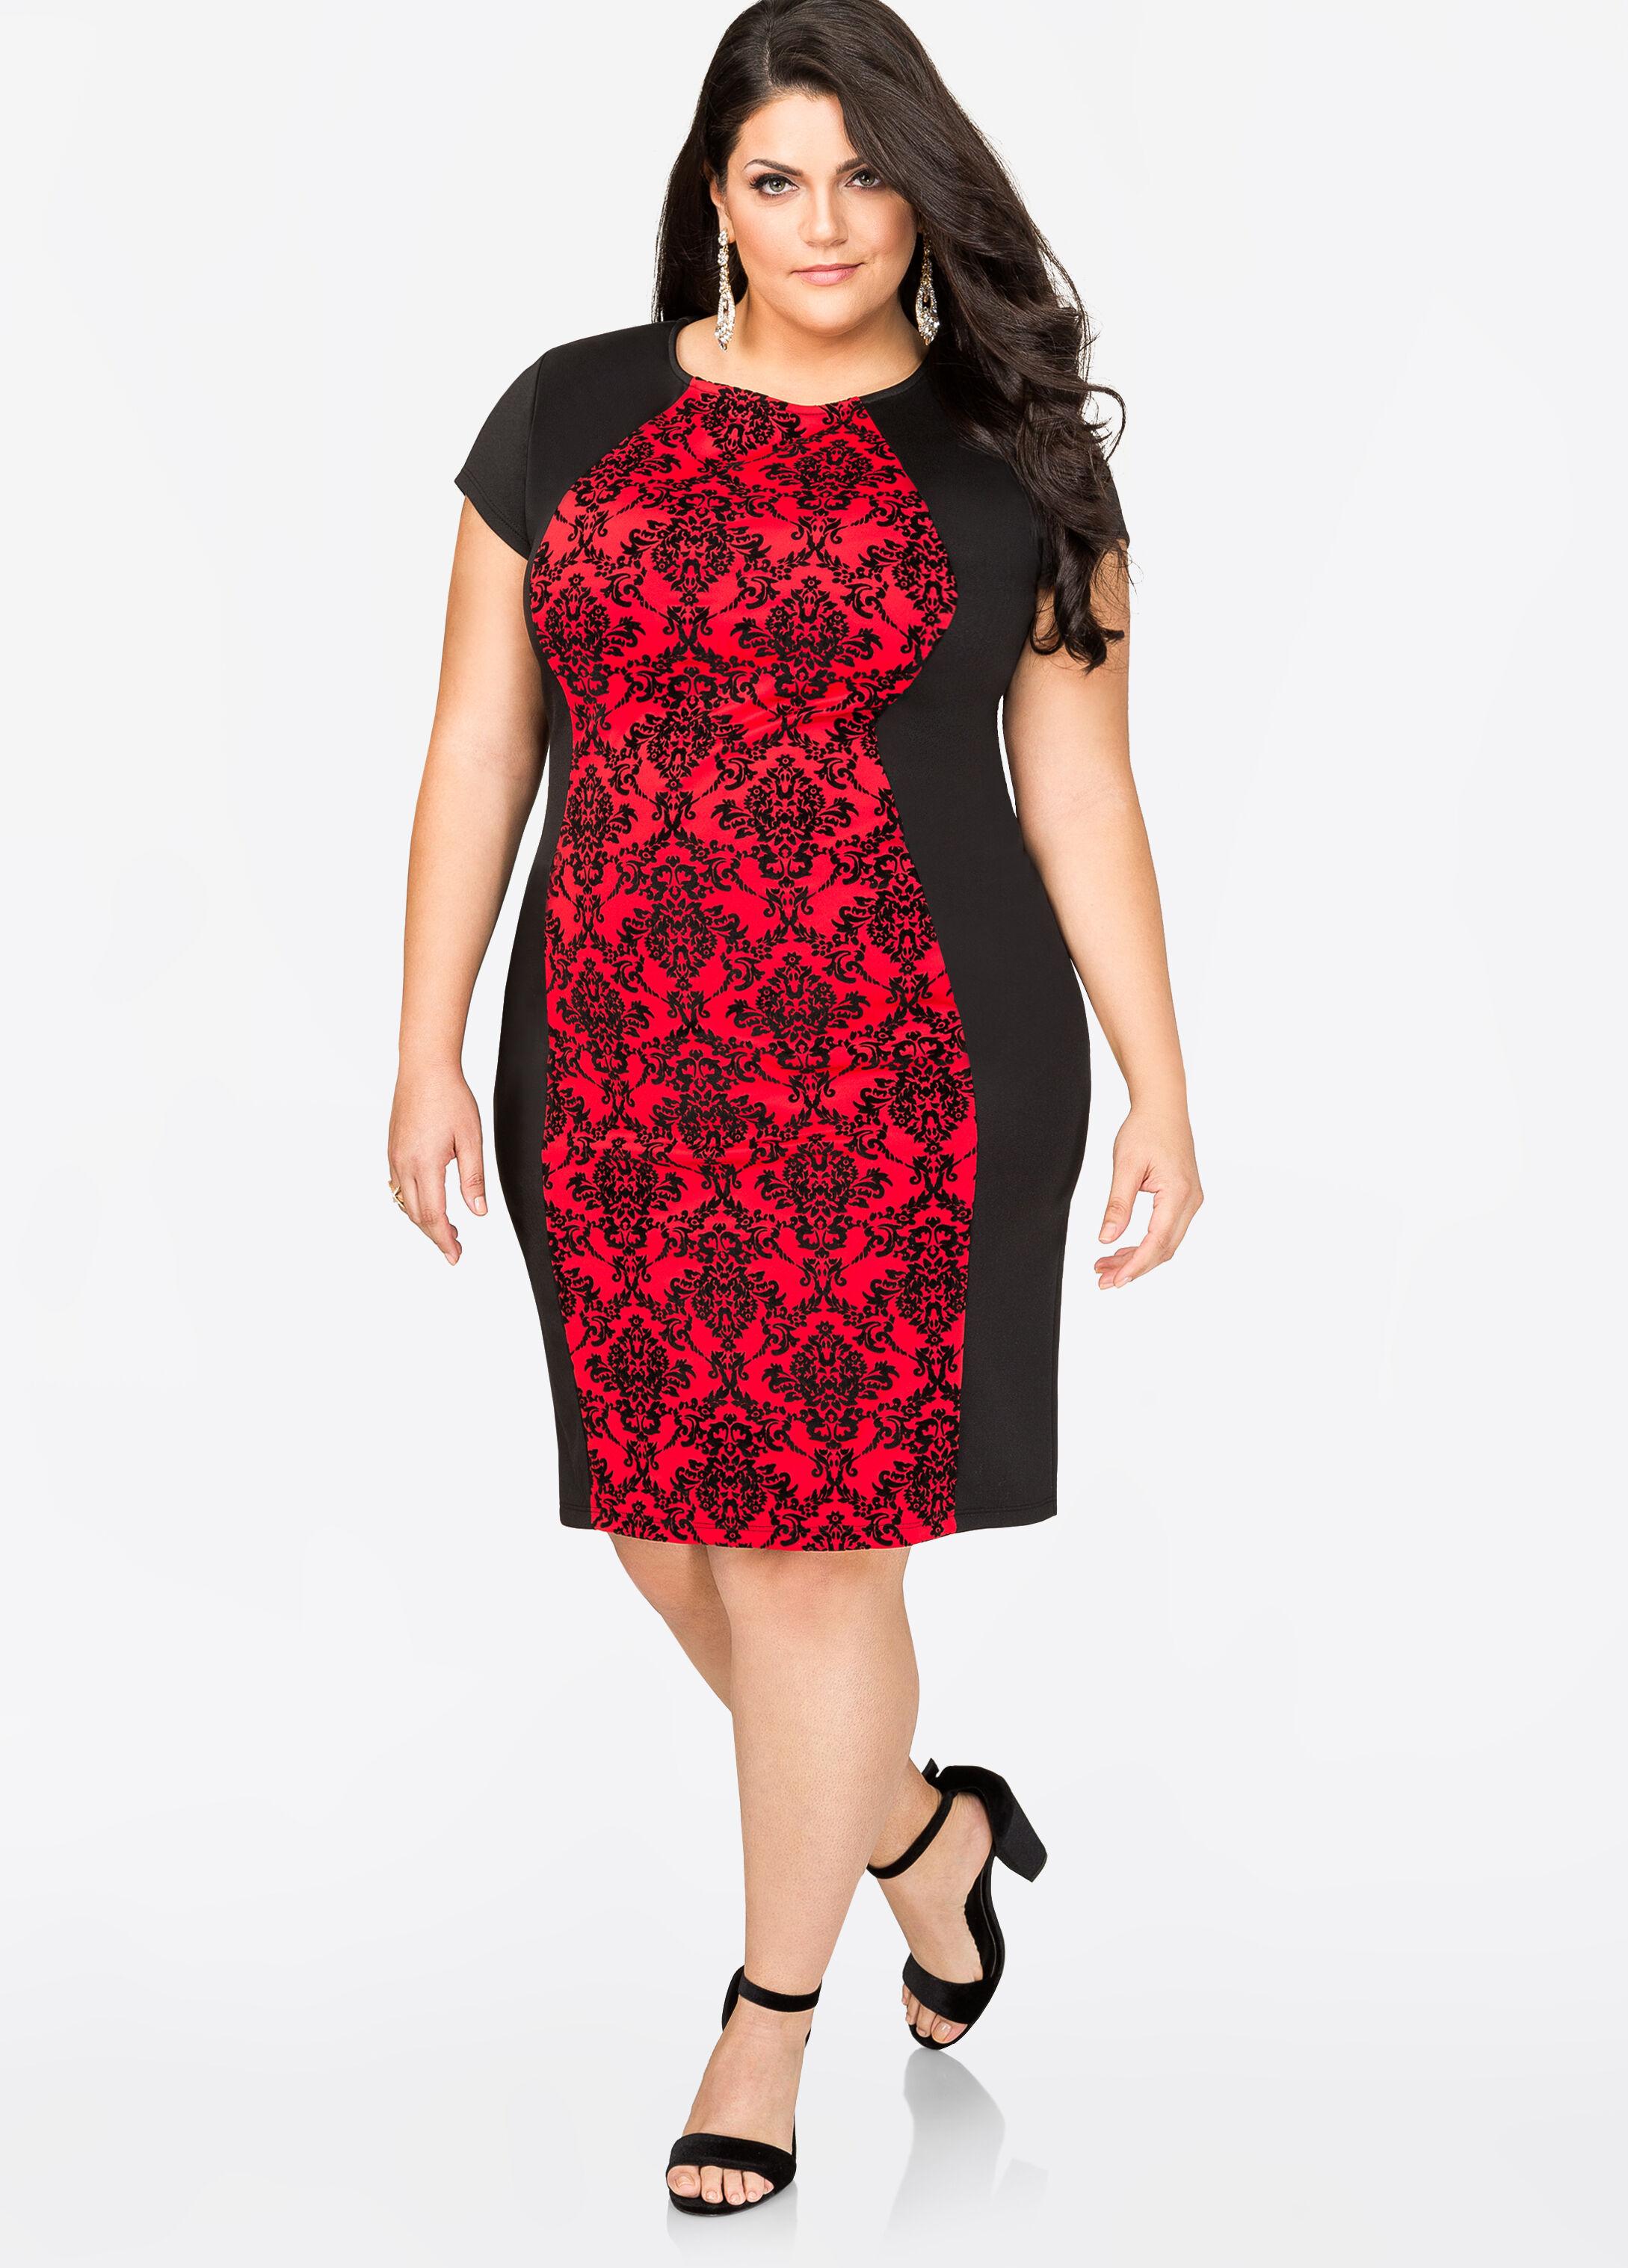 Fee g red dress night